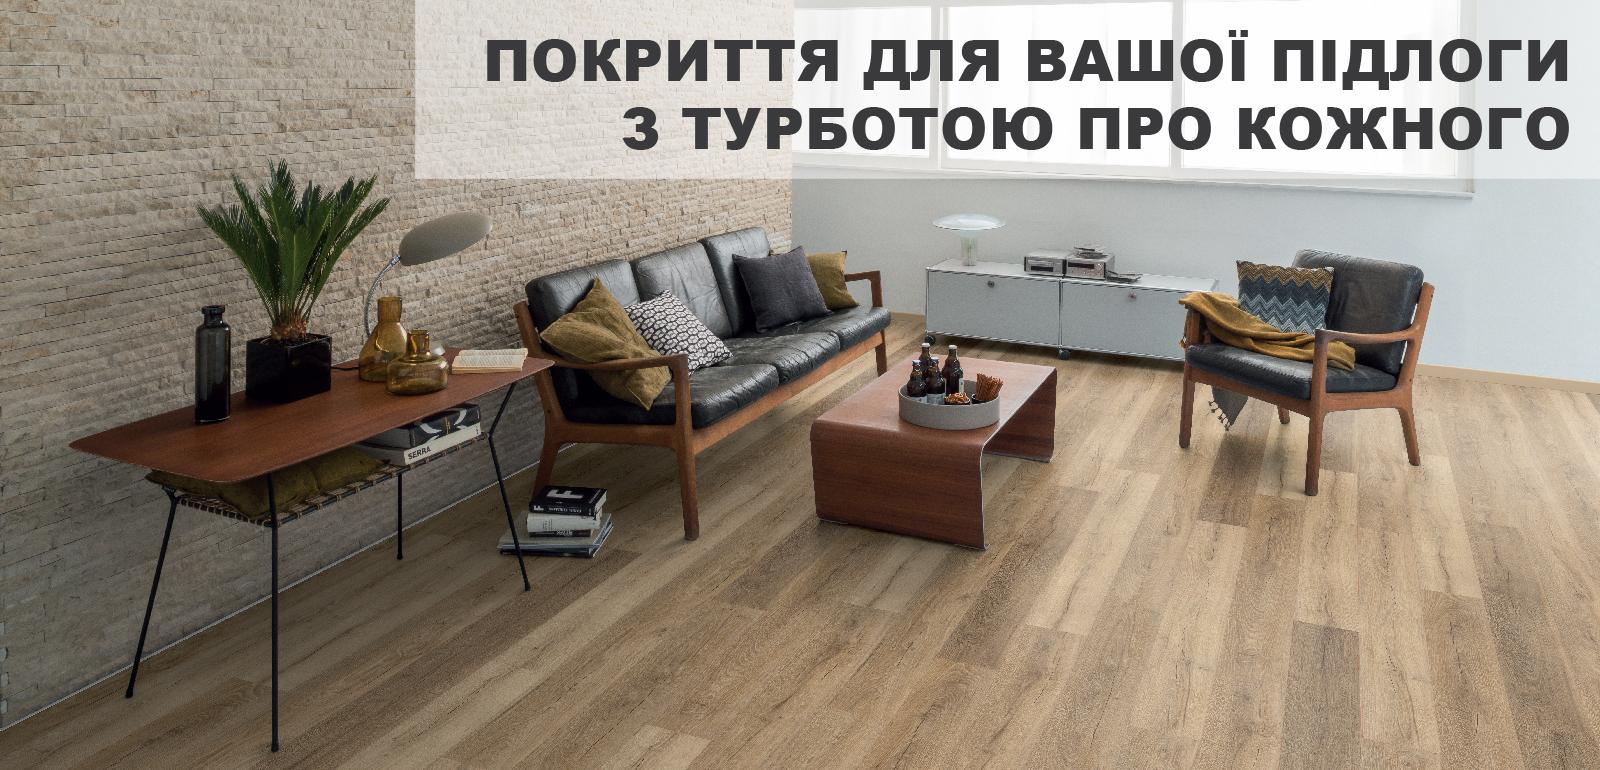 baner_1600x770_mm_1-01